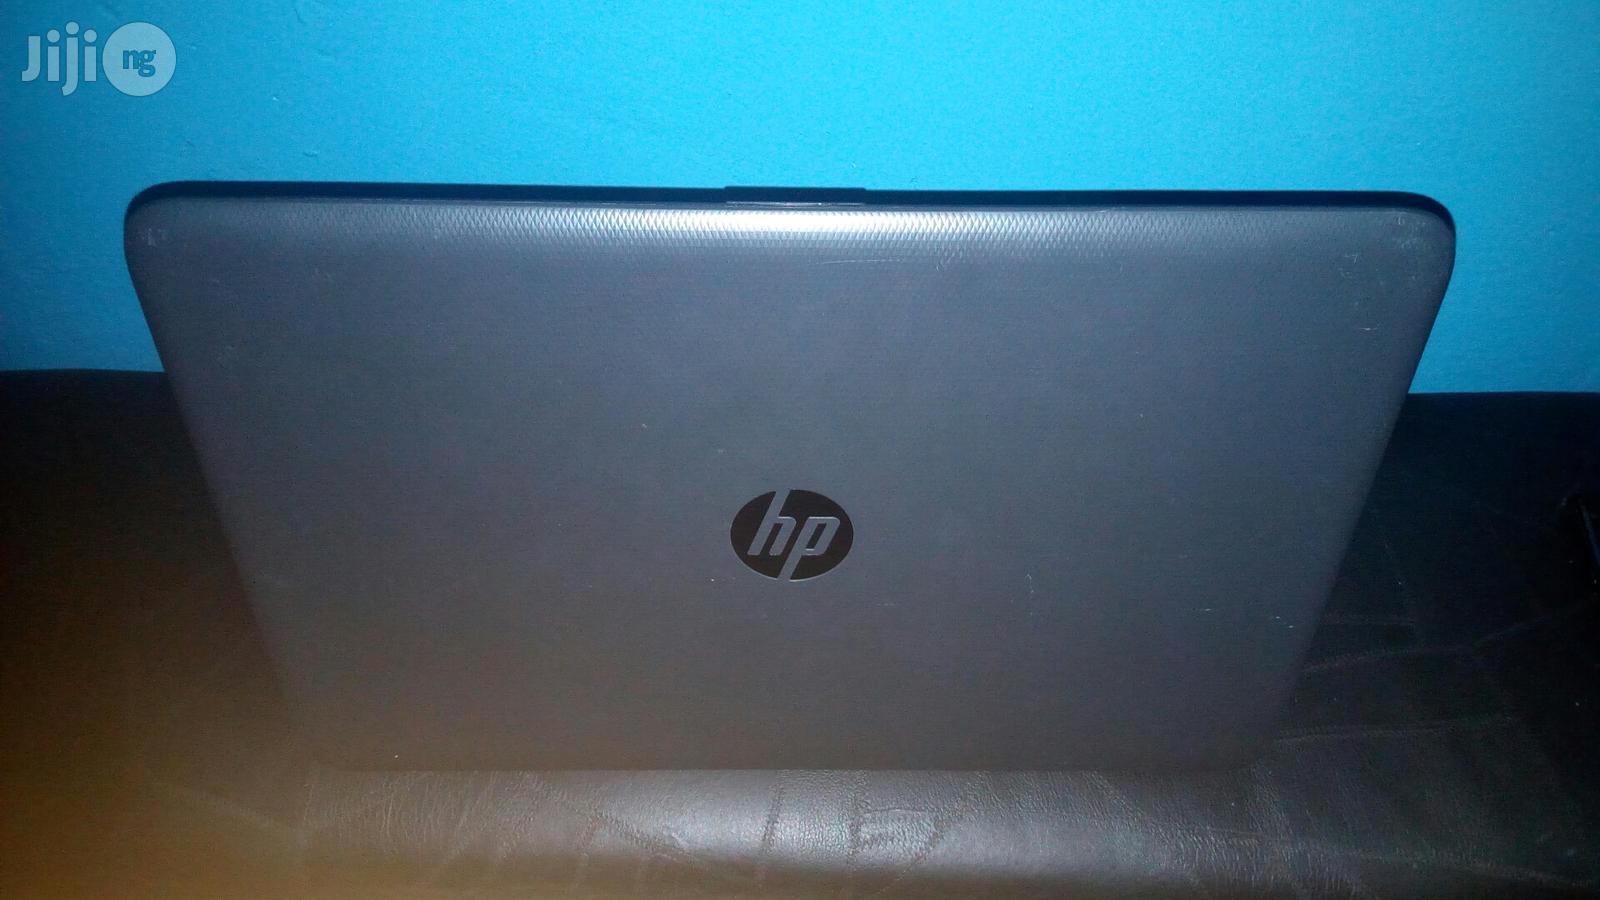 HP 250 Intel Laptop 500gb Hard Disk 4gb Ram   Laptops & Computers for sale in Ikeja, Lagos State, Nigeria